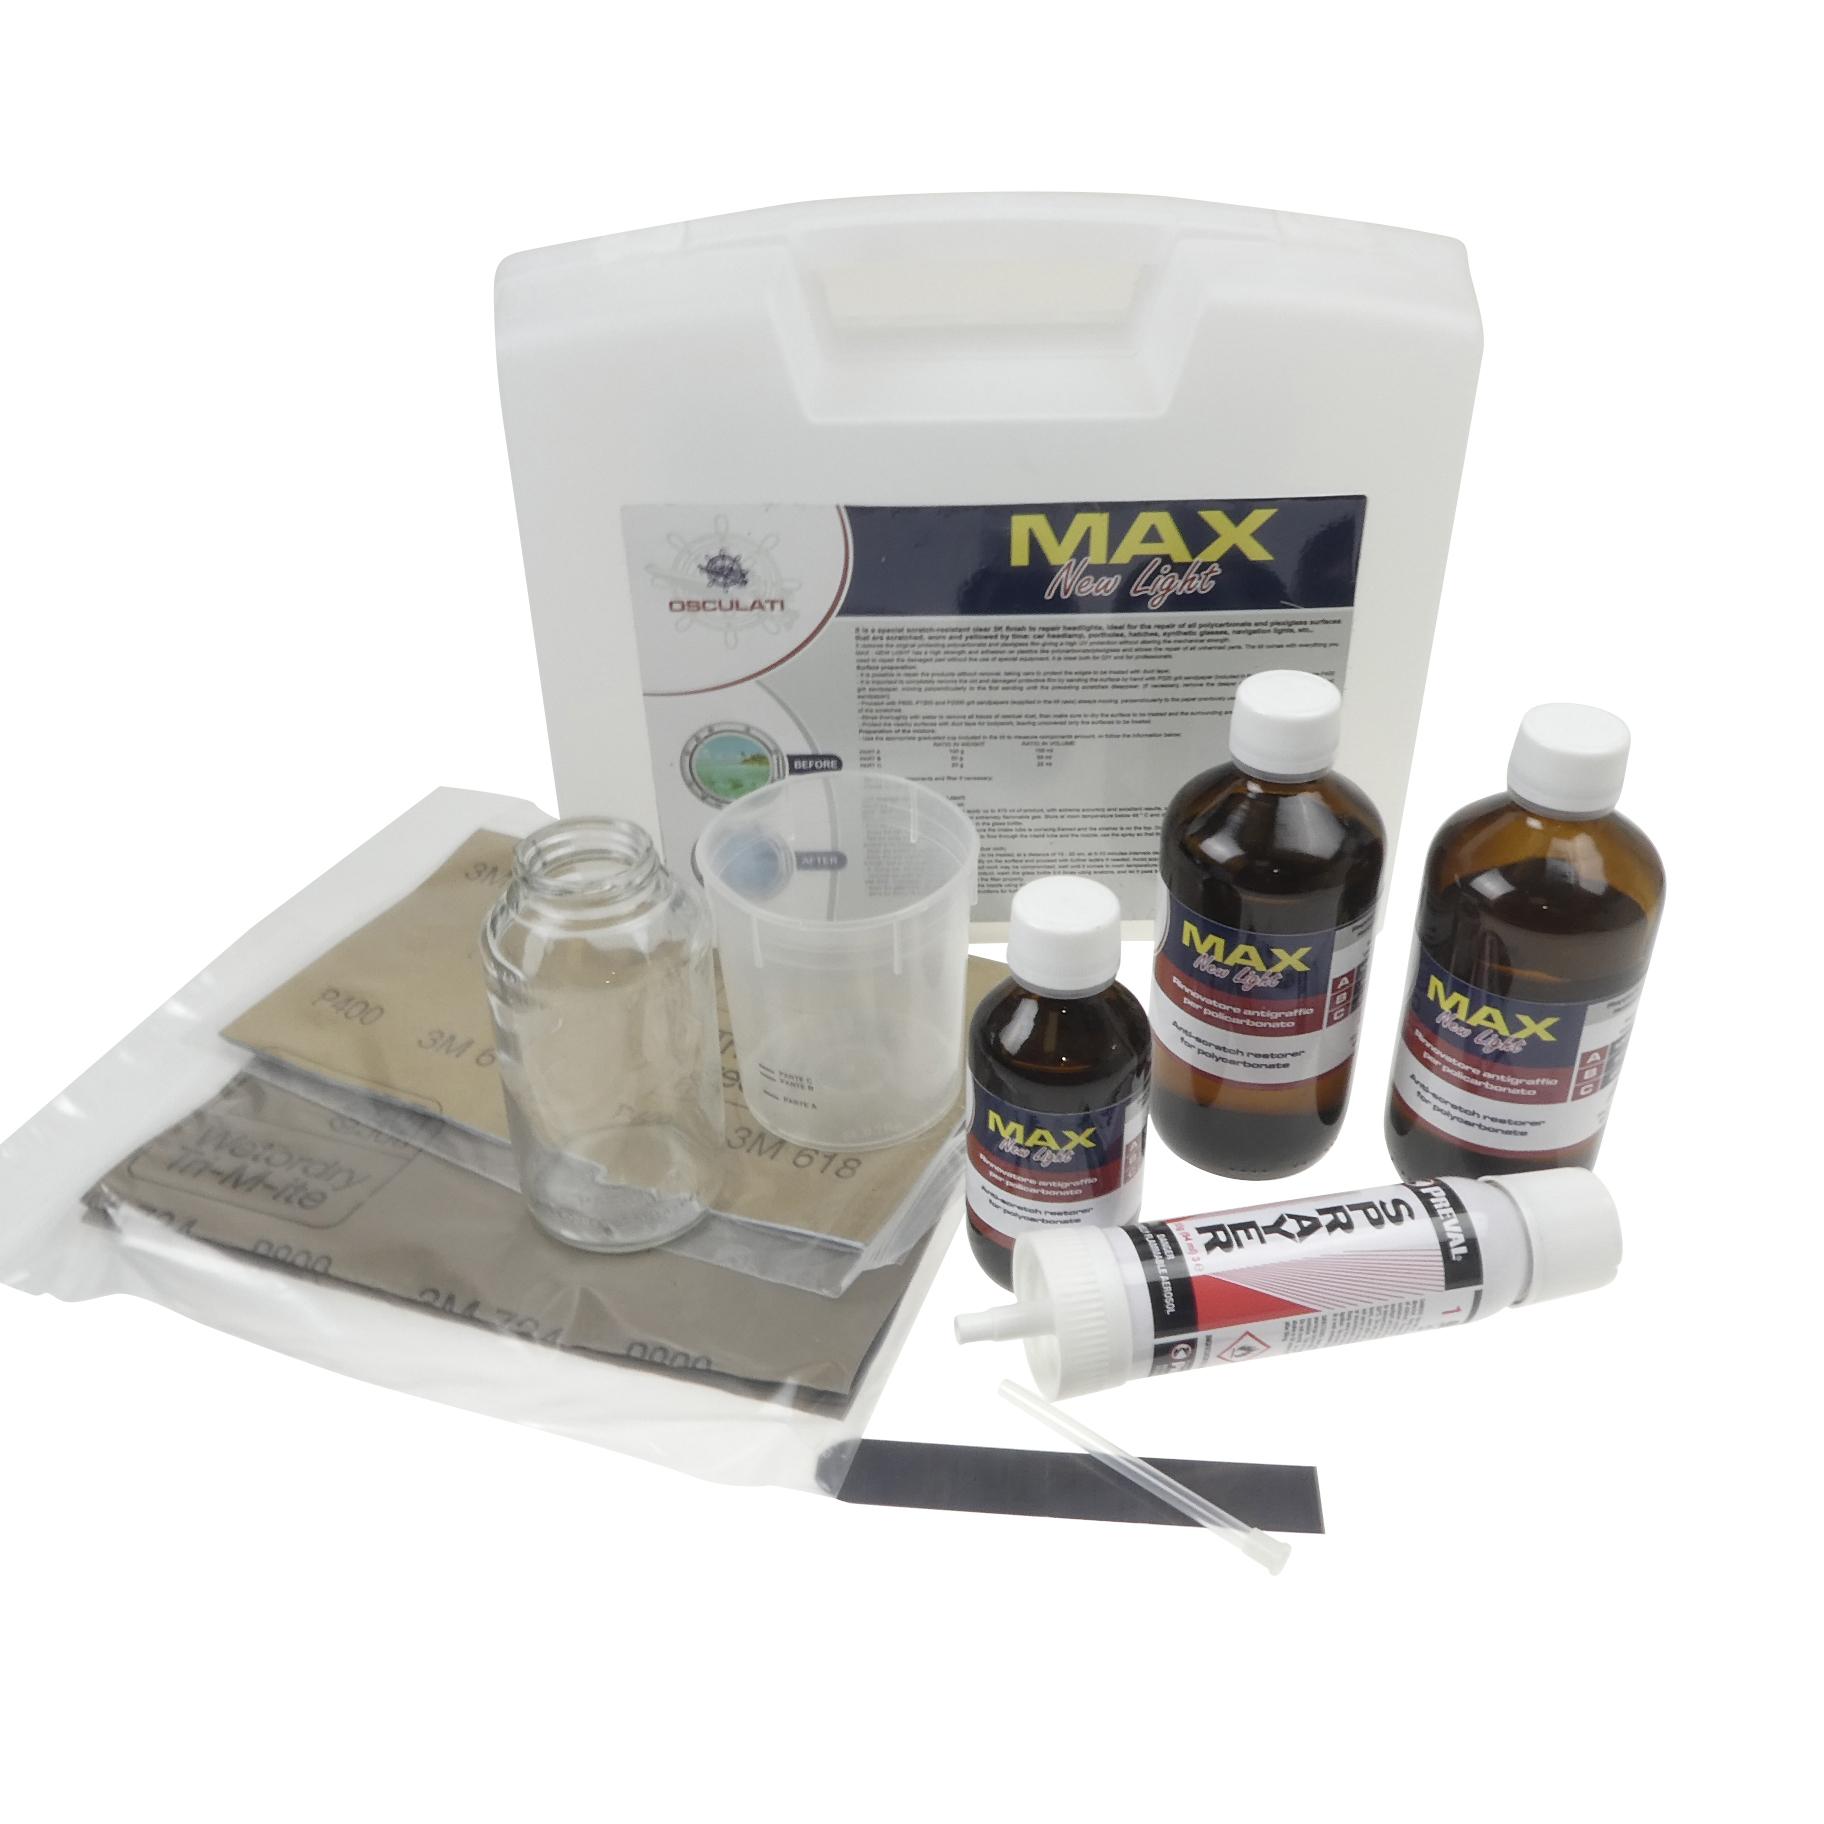 Max New Light Polycarbonate Anti-Scratch Restorer